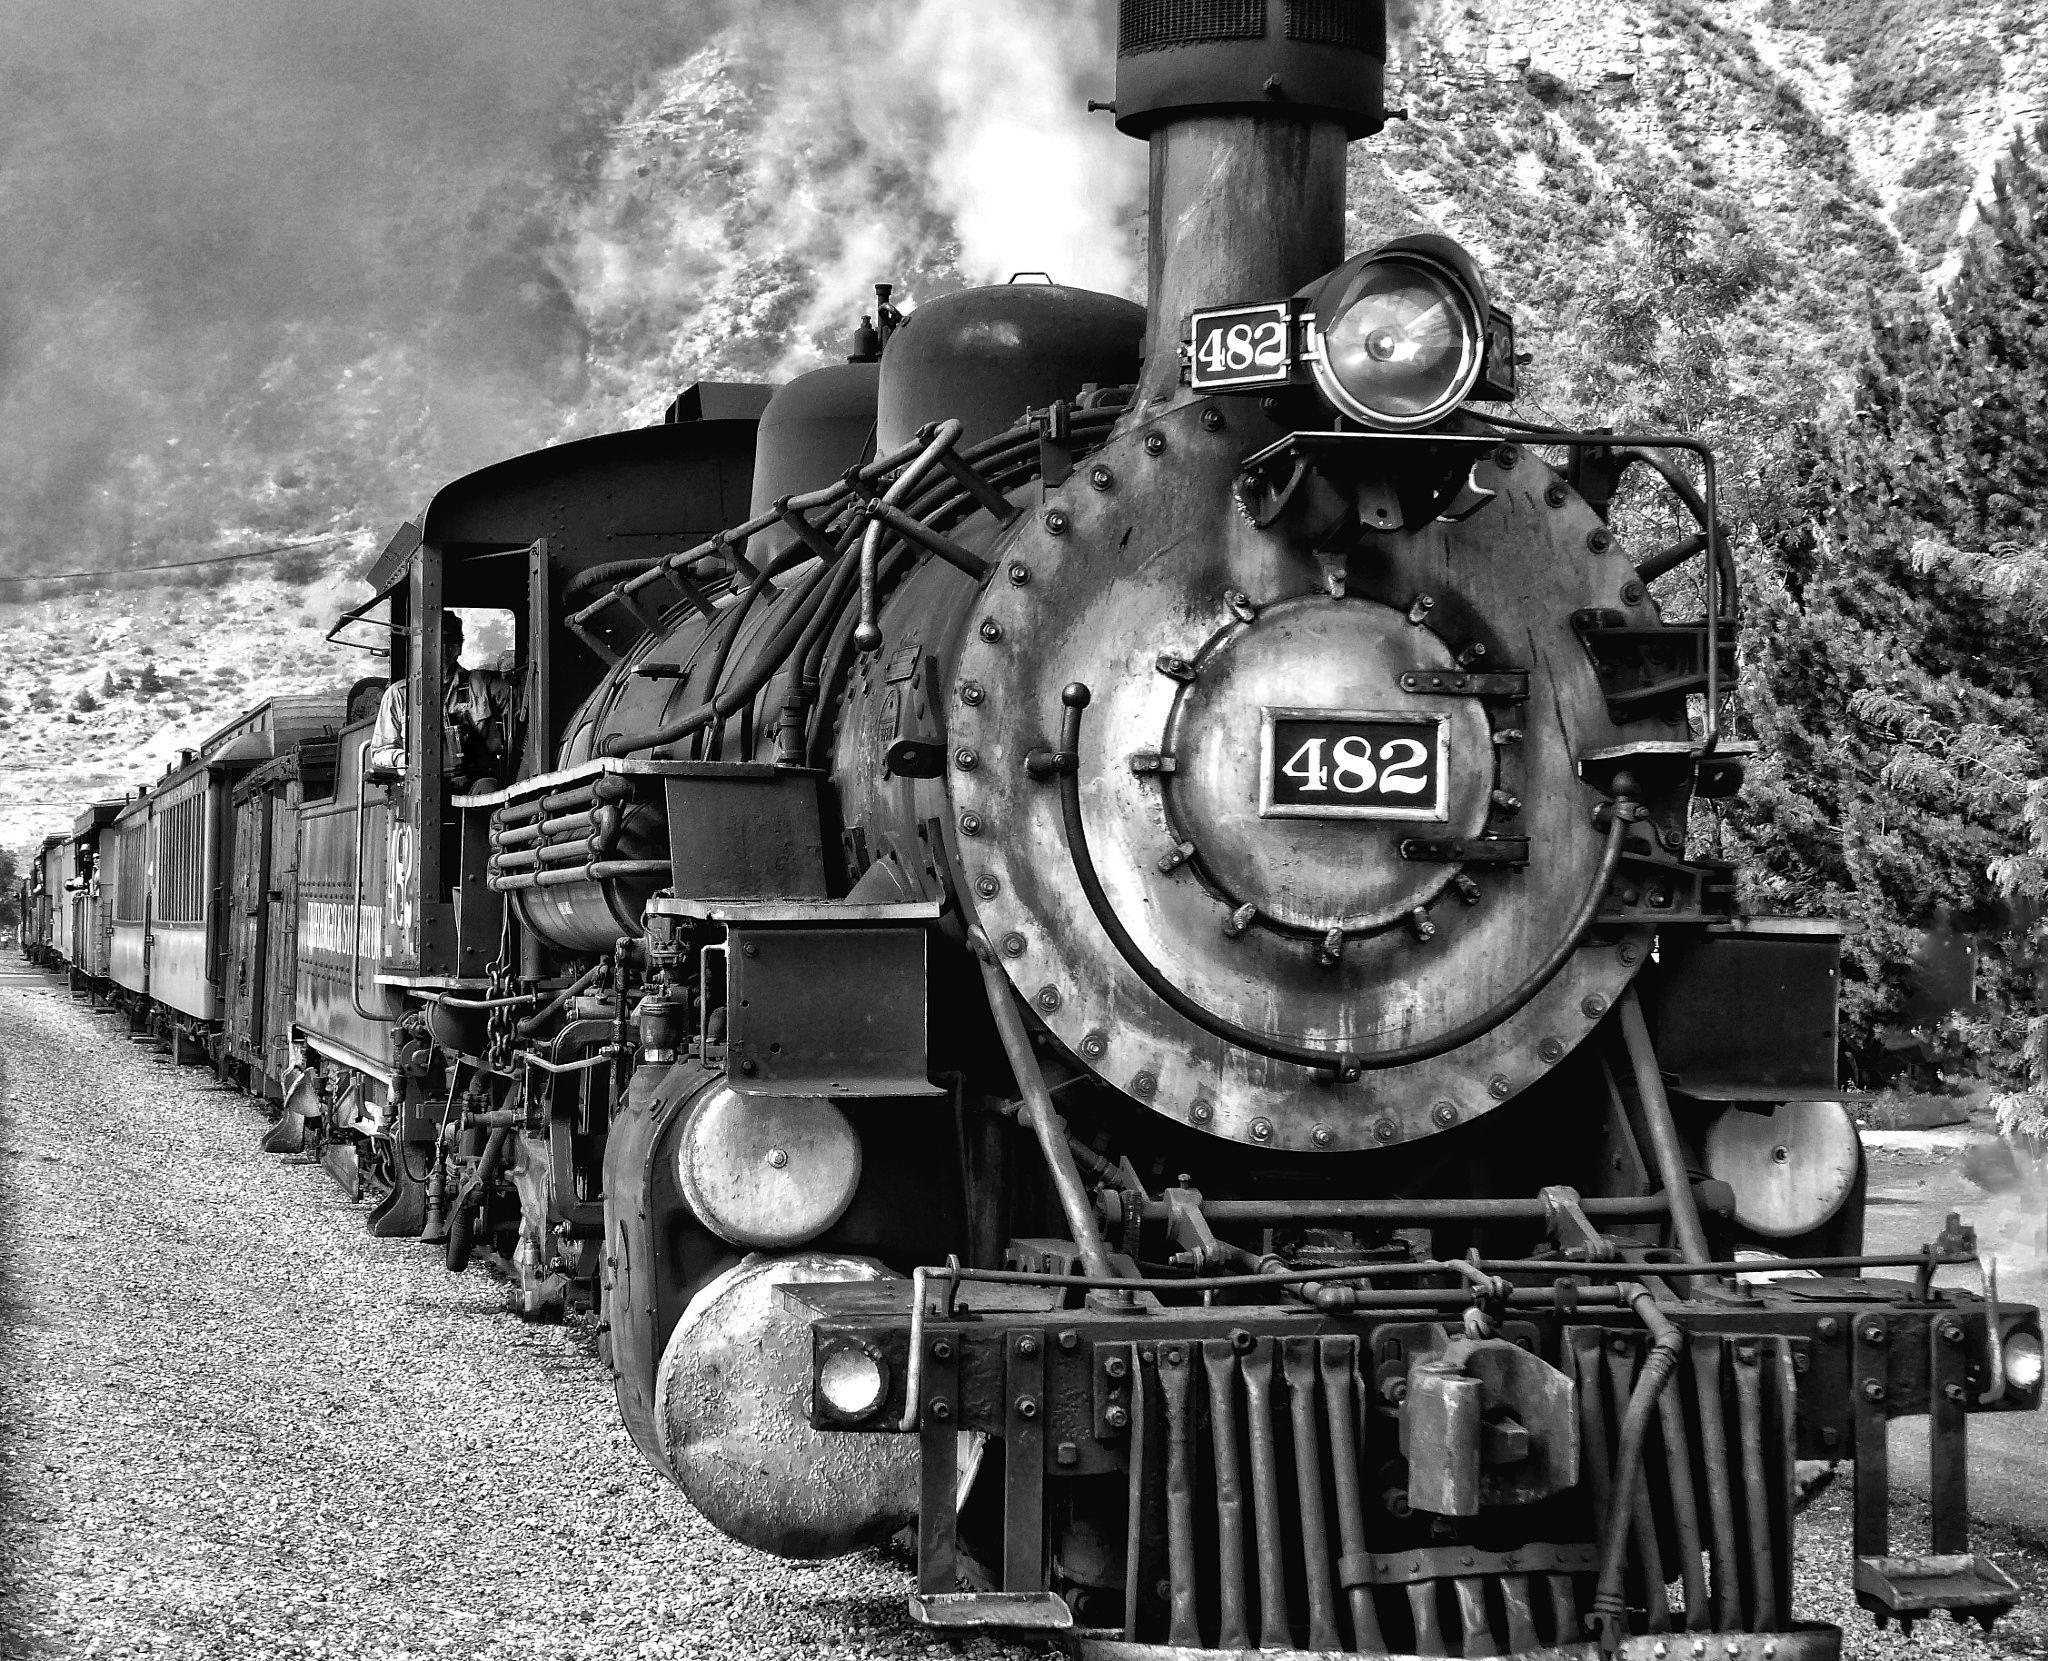 The narrow gauge railroad leaving the station at Durango, Colorado